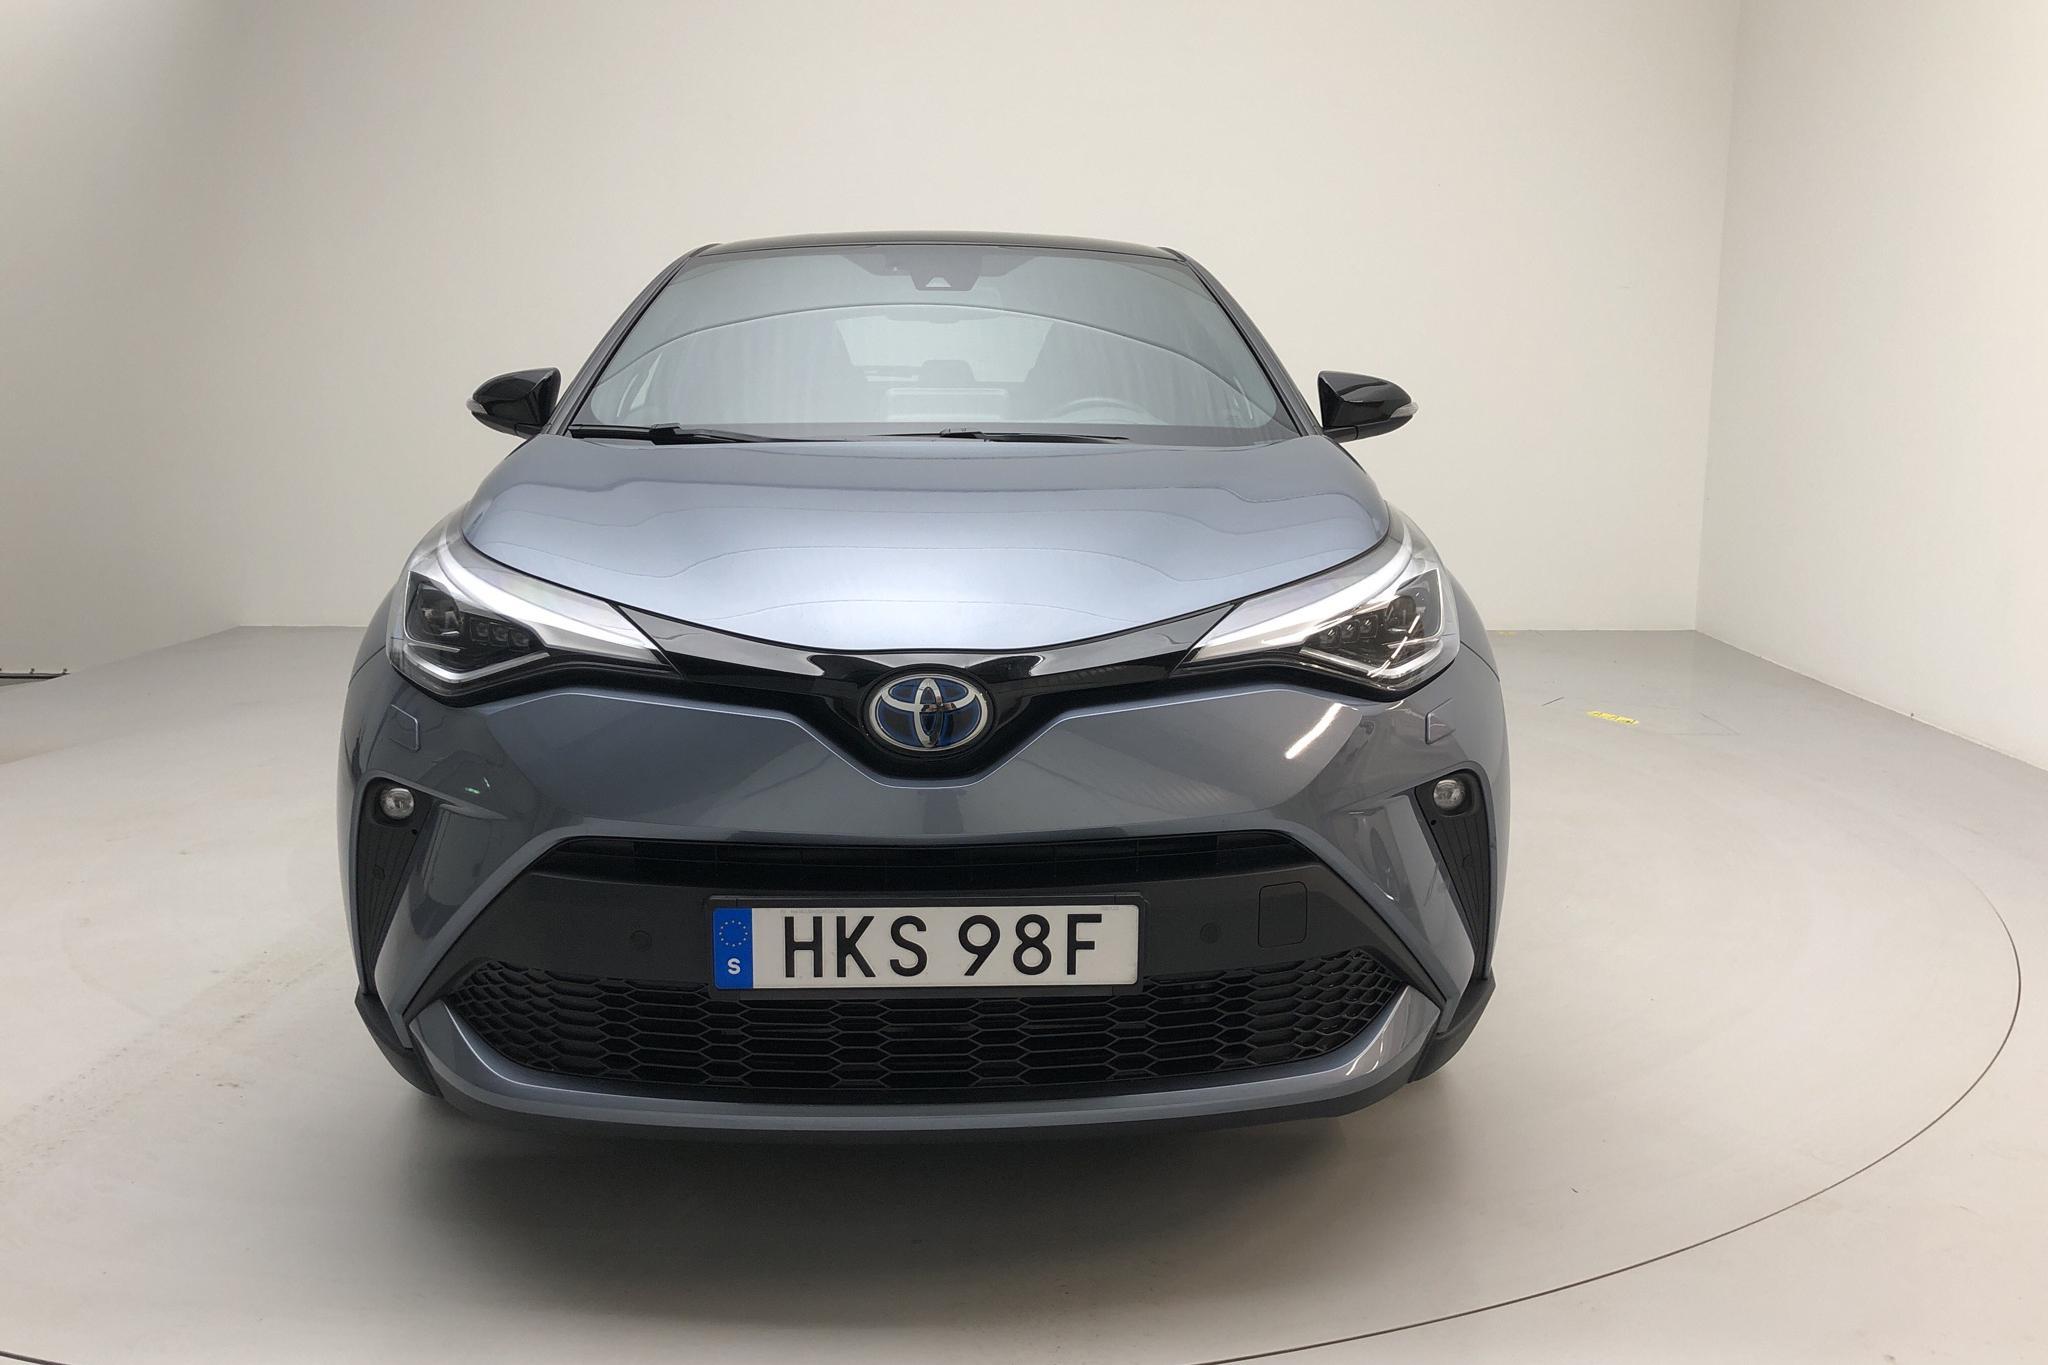 Toyota C-HR 2.0 HSD LCI (184hk) - 3 213 mil - Automat - grå - 2020